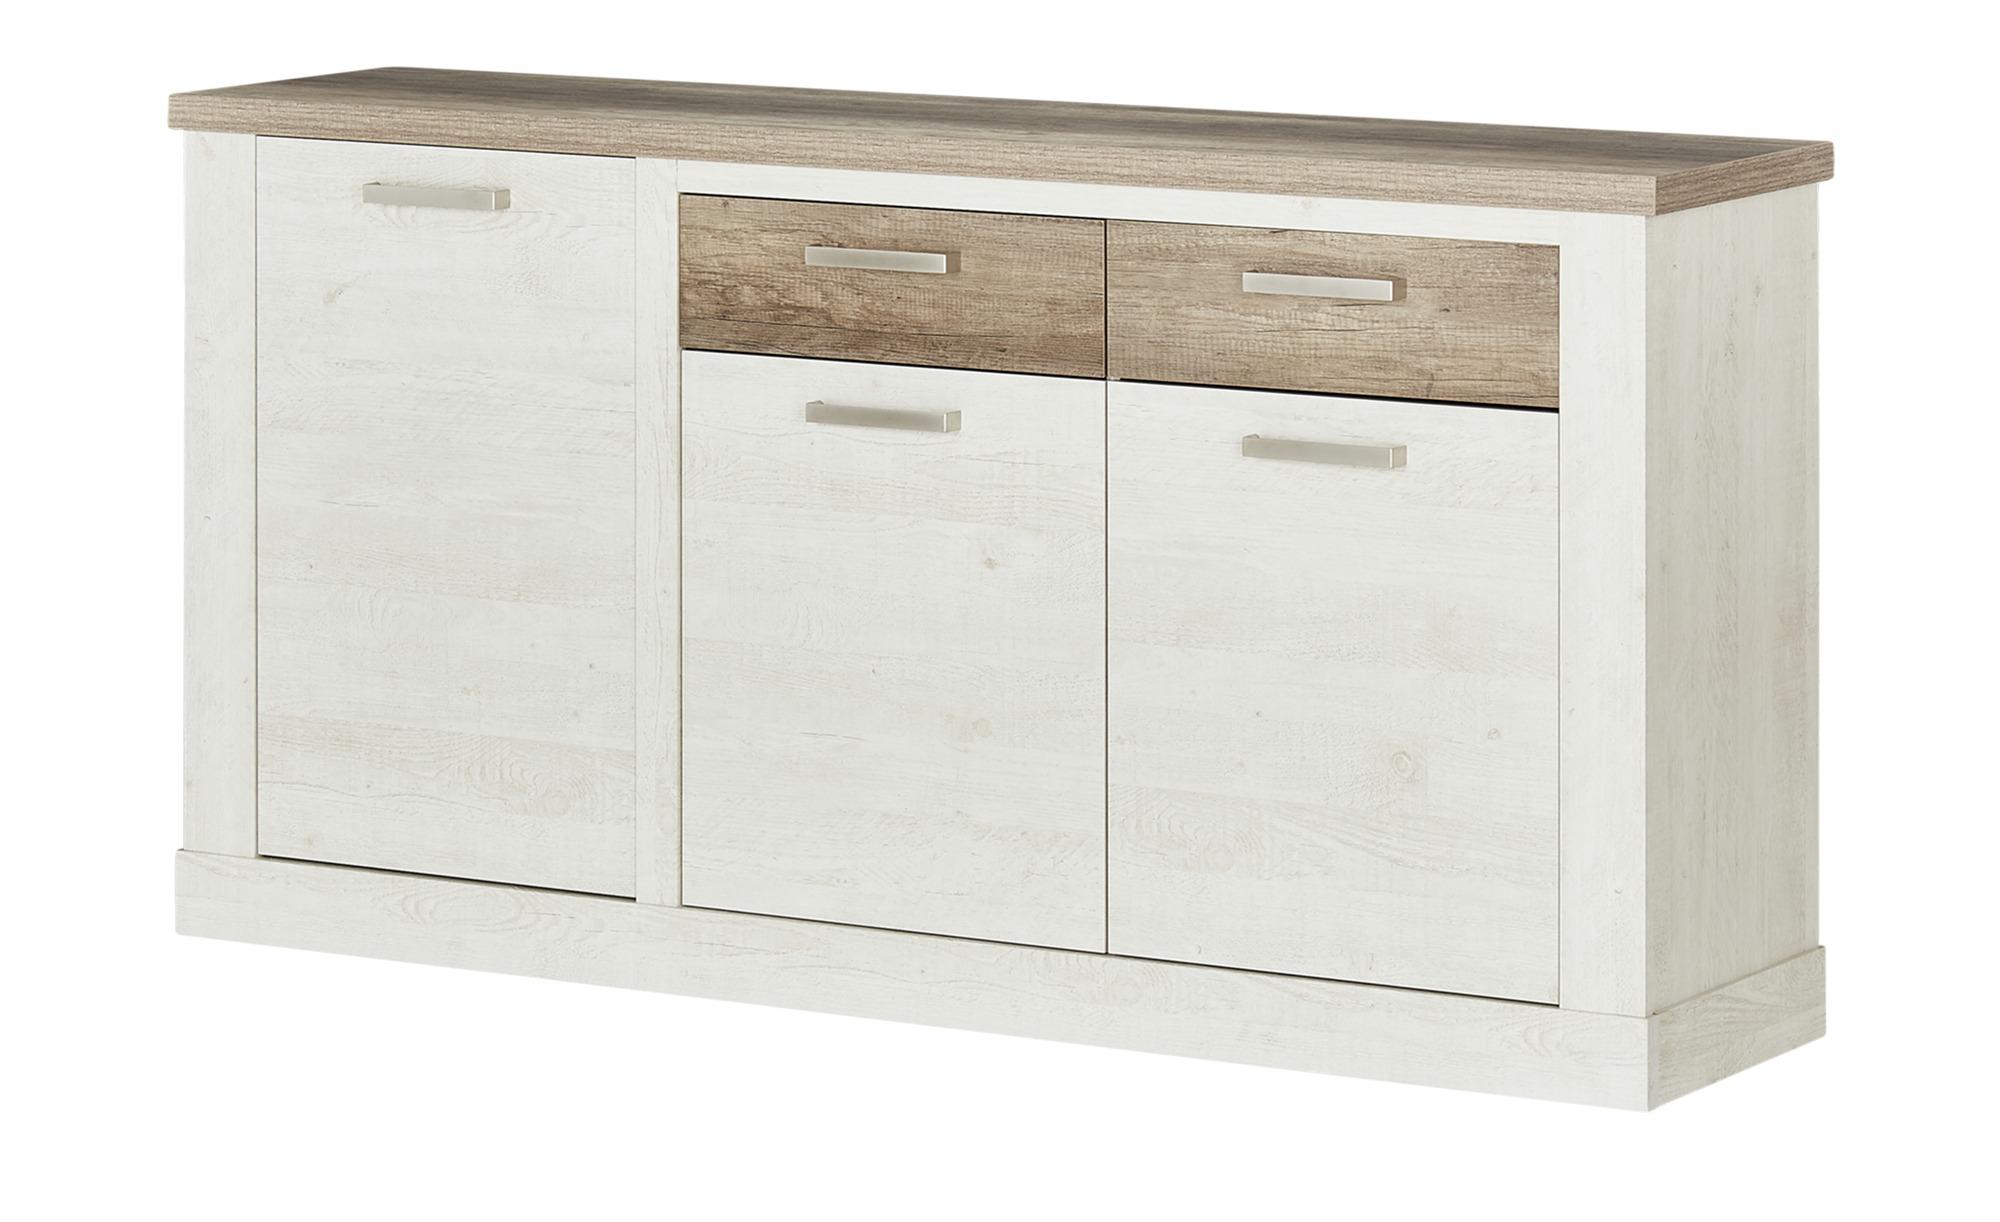 Sideboard  Viareggio ¦ weiß ¦ Maße (cm): B: 173,9 H: 90,3 T: 41,3 Kommoden & Sideboards > Sideboards - Höffner